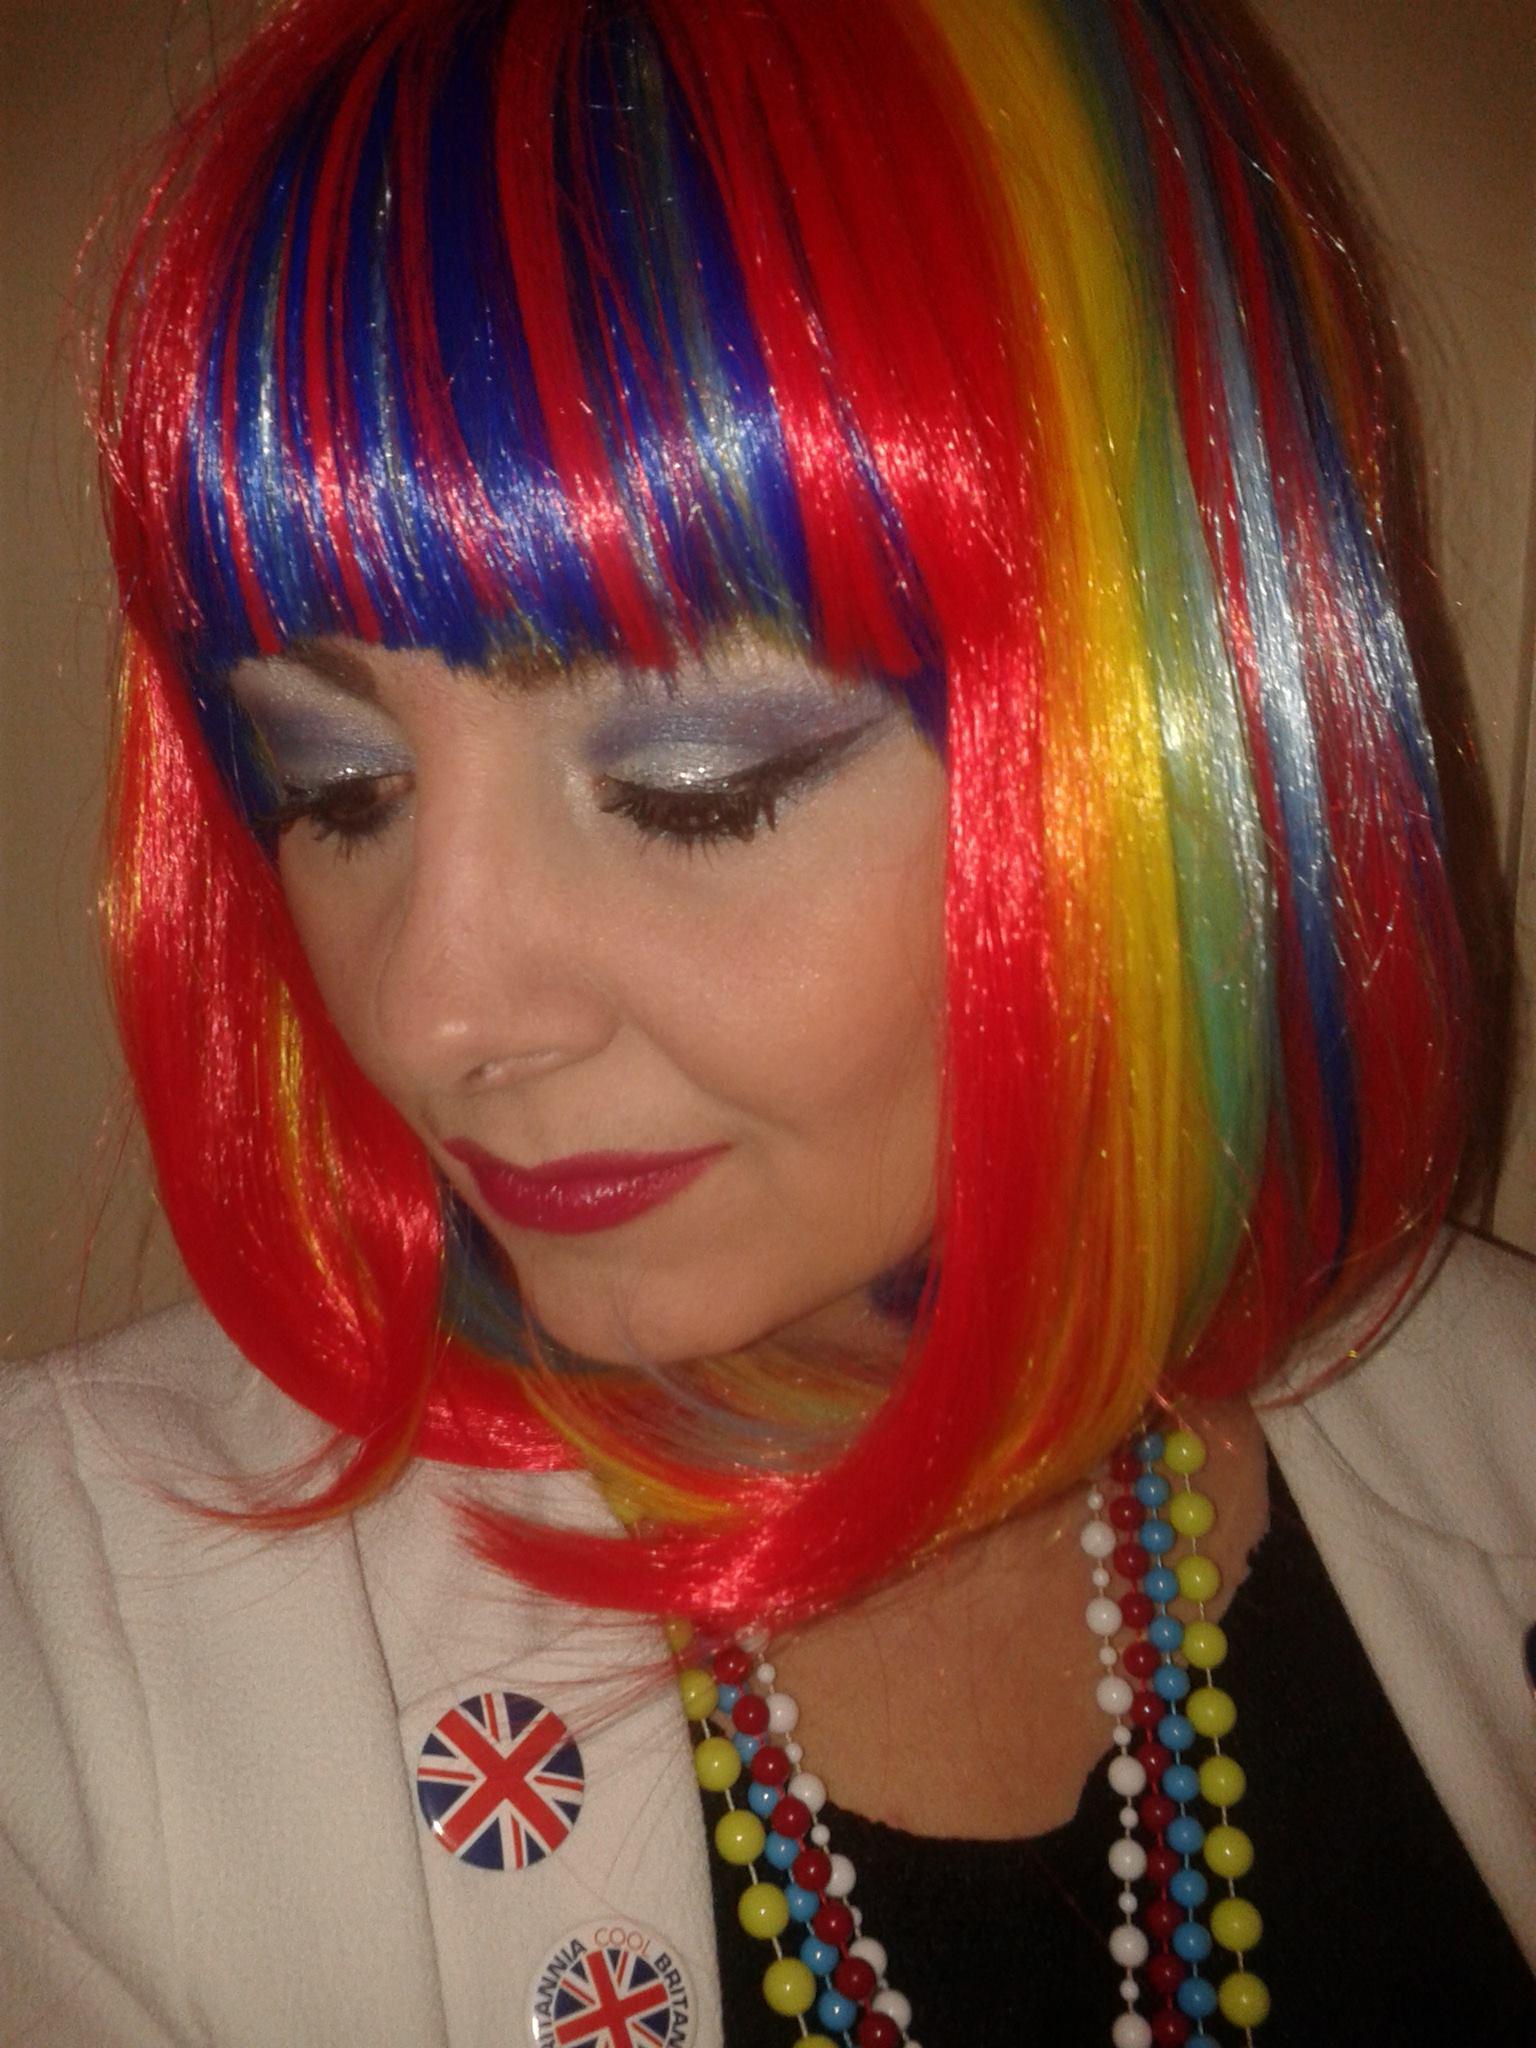 Leah-rainbow wig-60s band Kent